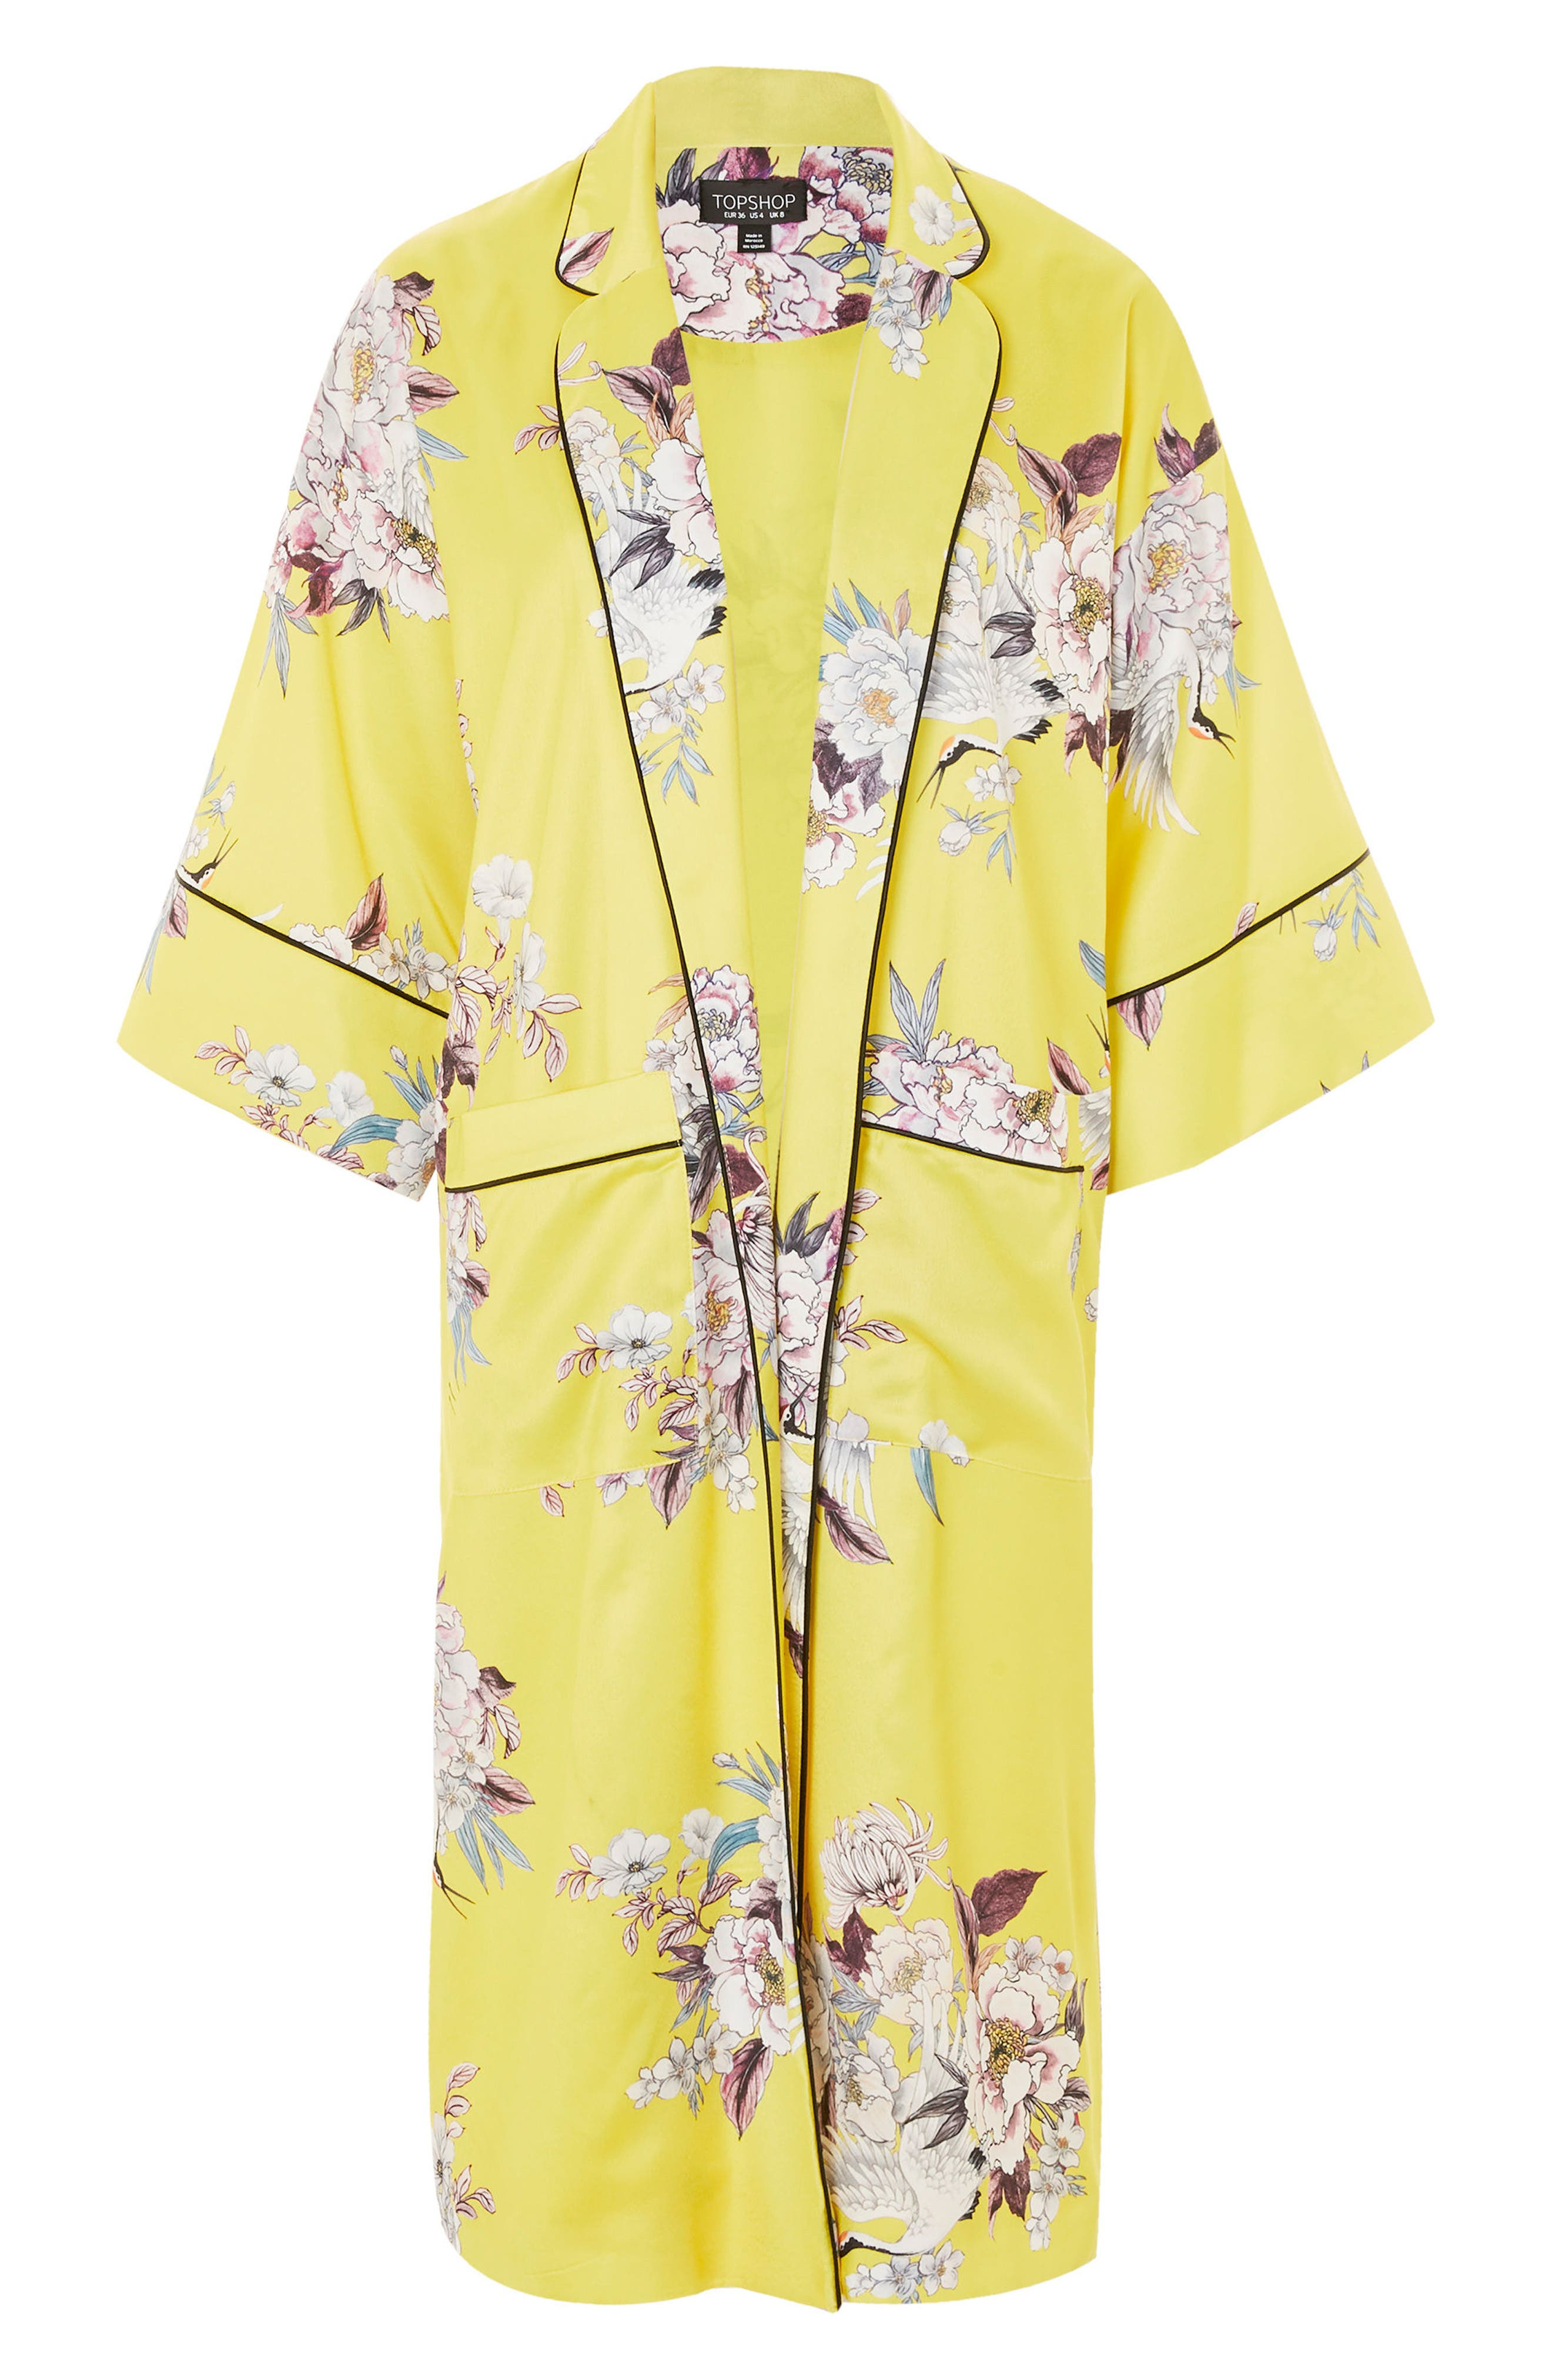 Heron Print Kimono,                             Alternate thumbnail 4, color,